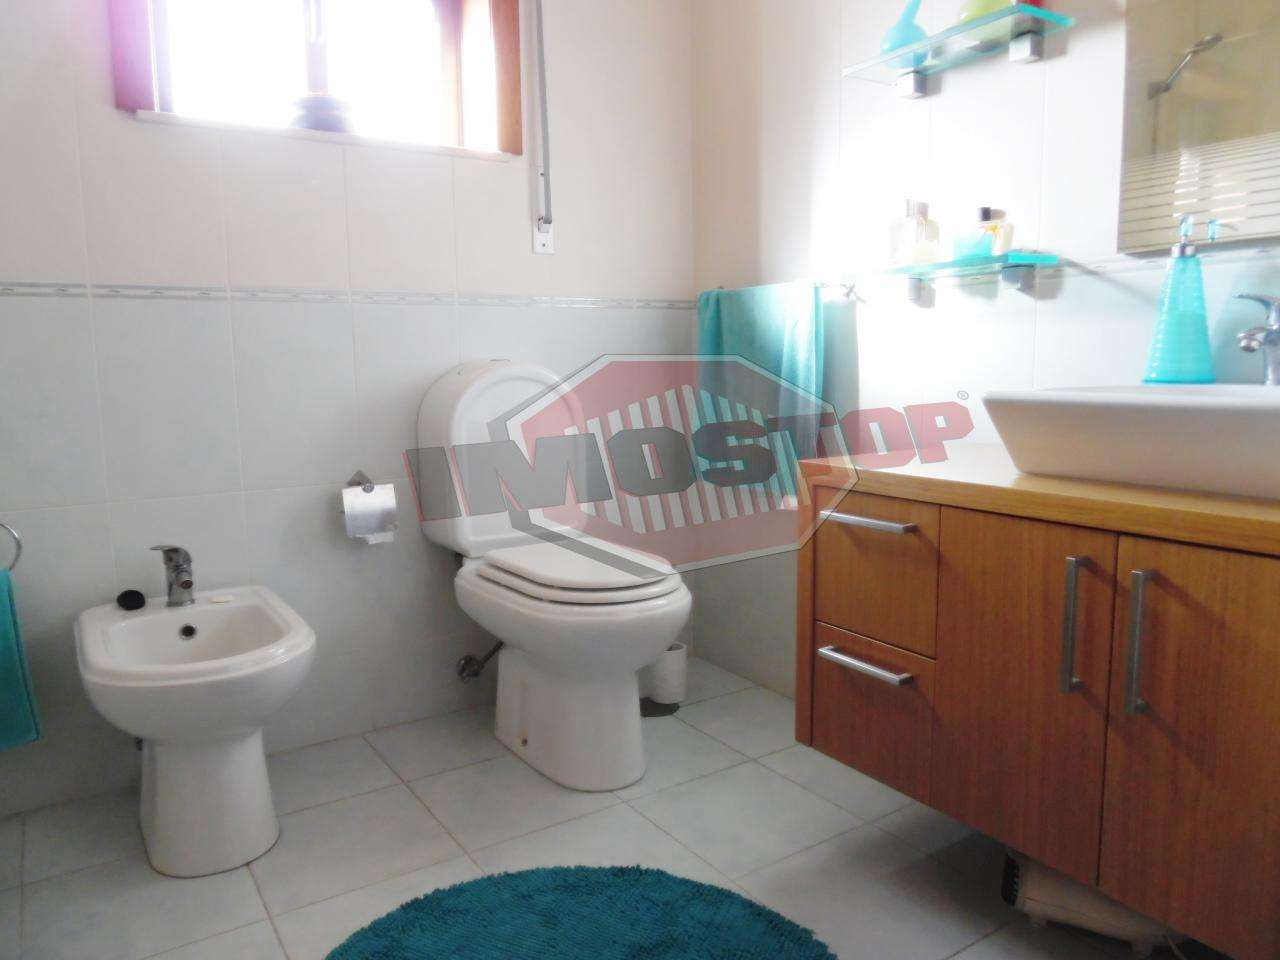 Apartamento para comprar, Oiã, Oliveira do Bairro, Aveiro - Foto 12